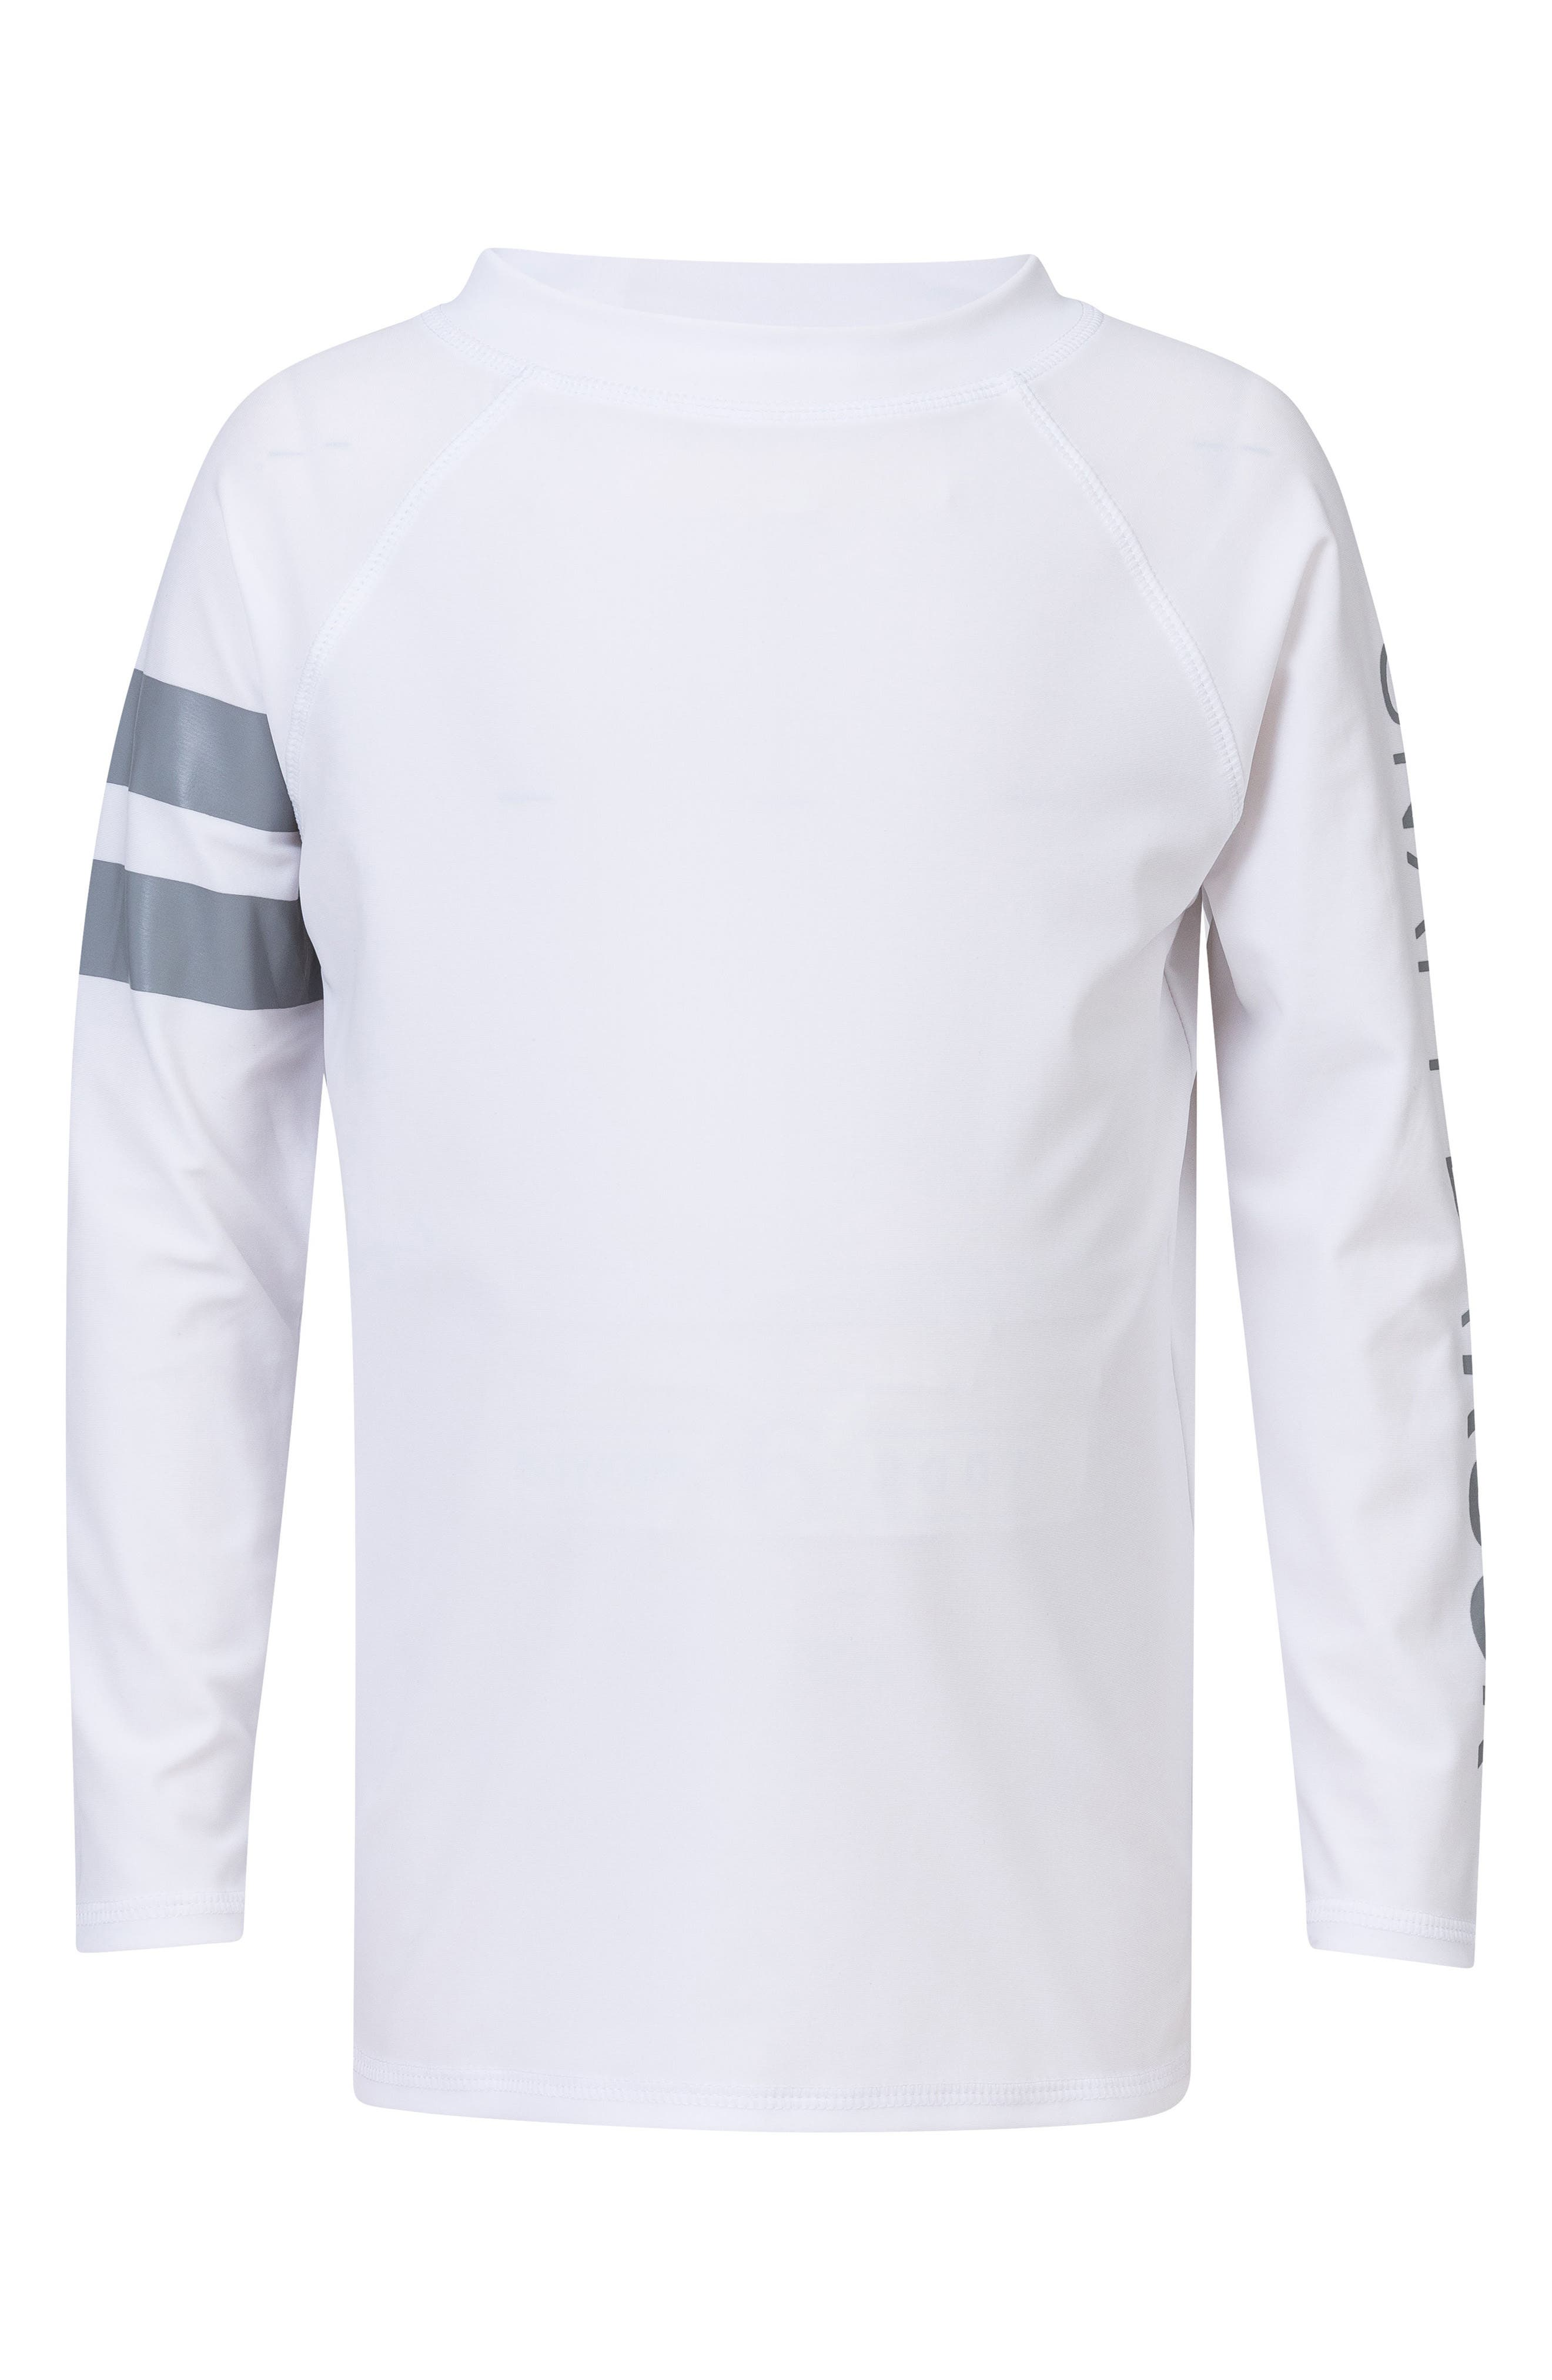 Raglan Long Sleeve Rashguard,                         Main,                         color, White/ Grey